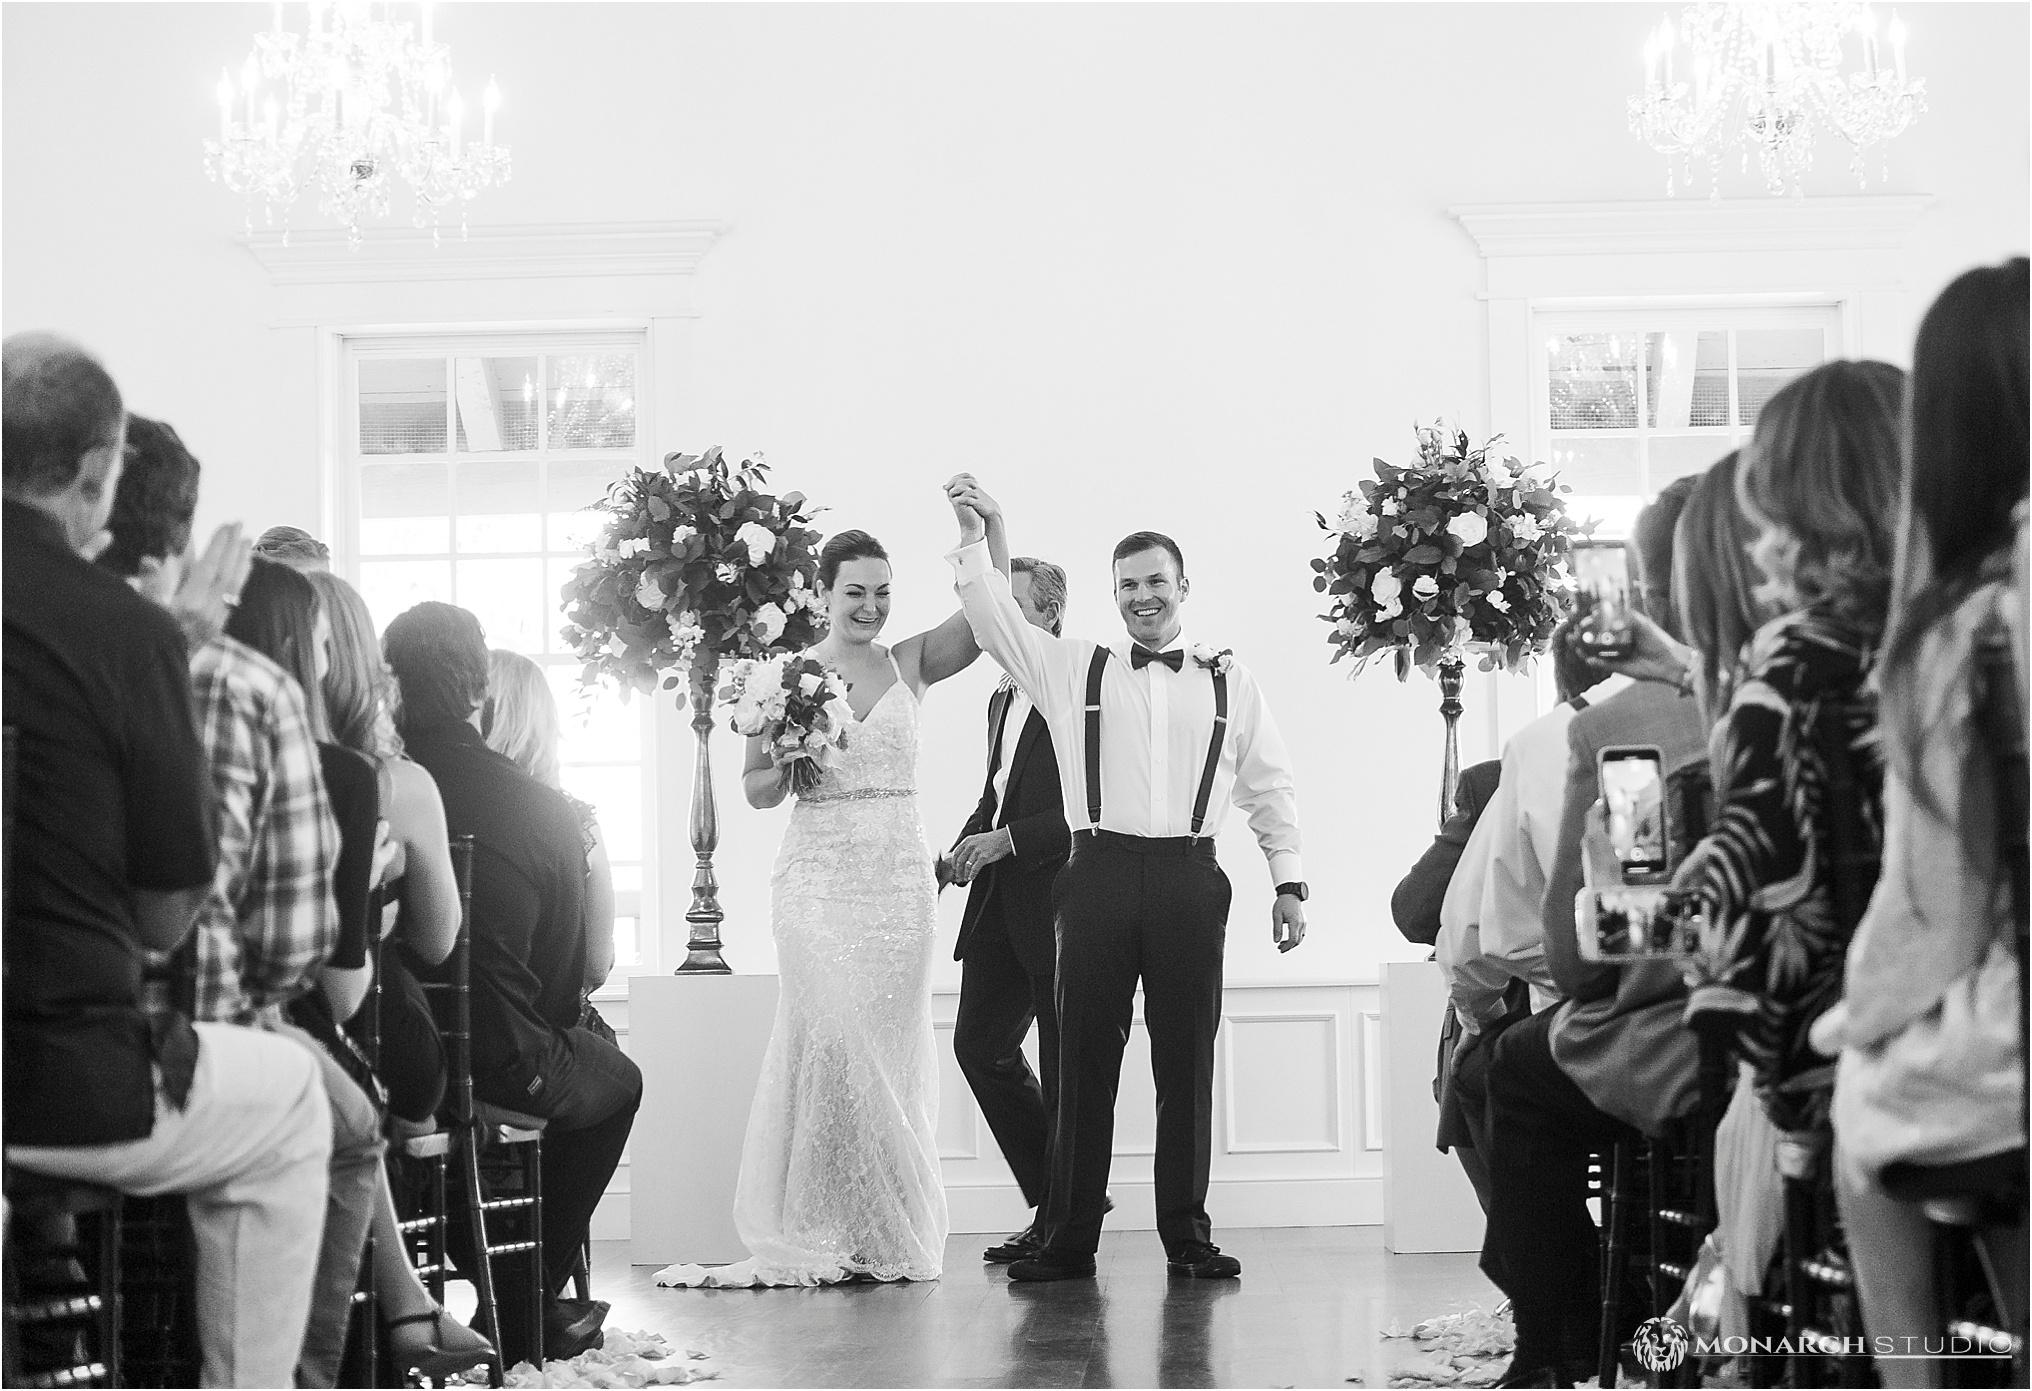 079-whiteroom-wedding-photographer-2019-05-22_0061.jpg